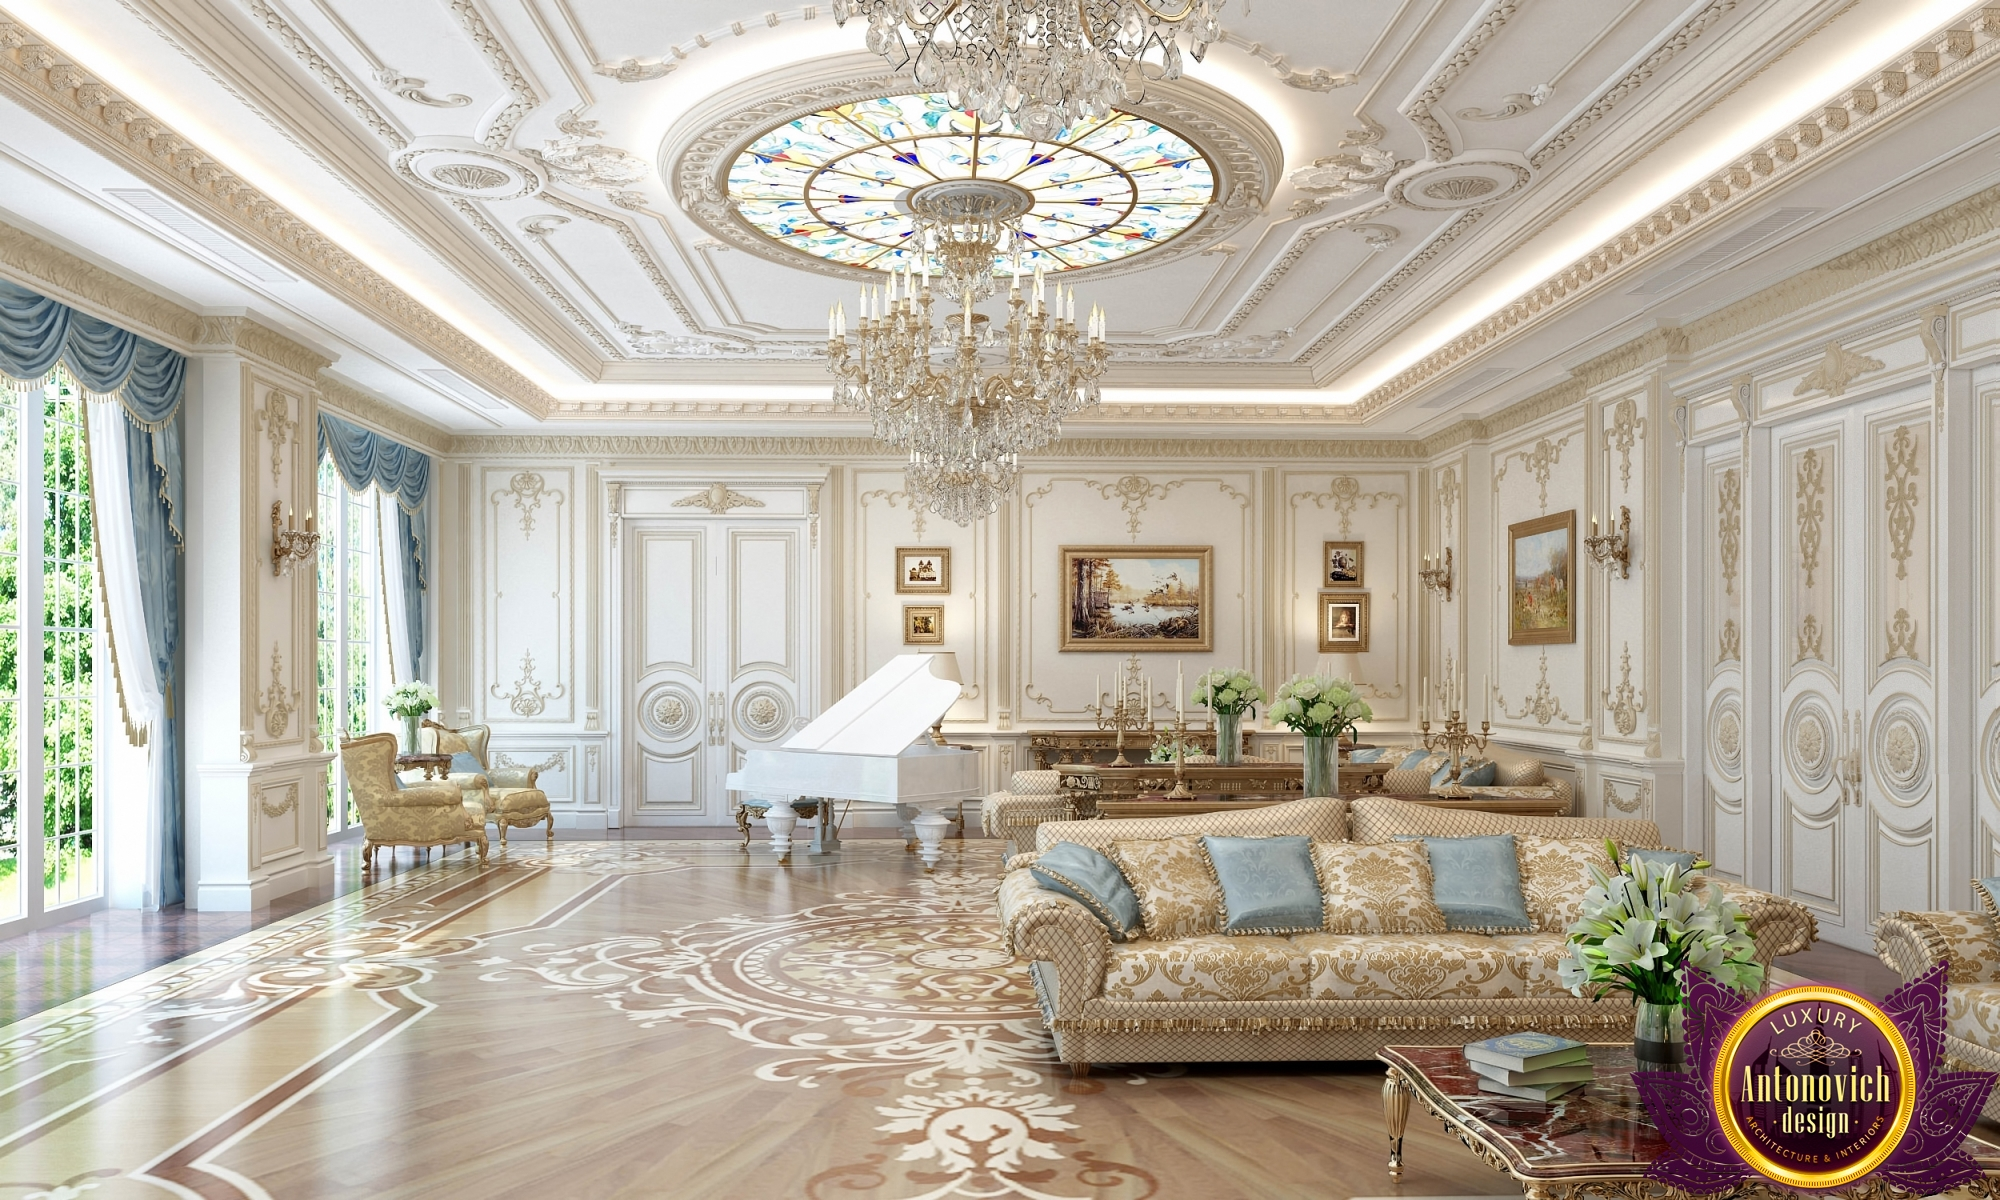 Money Wallpaper Hd 3d Free Photo Royal Room Pretty Living Images Free